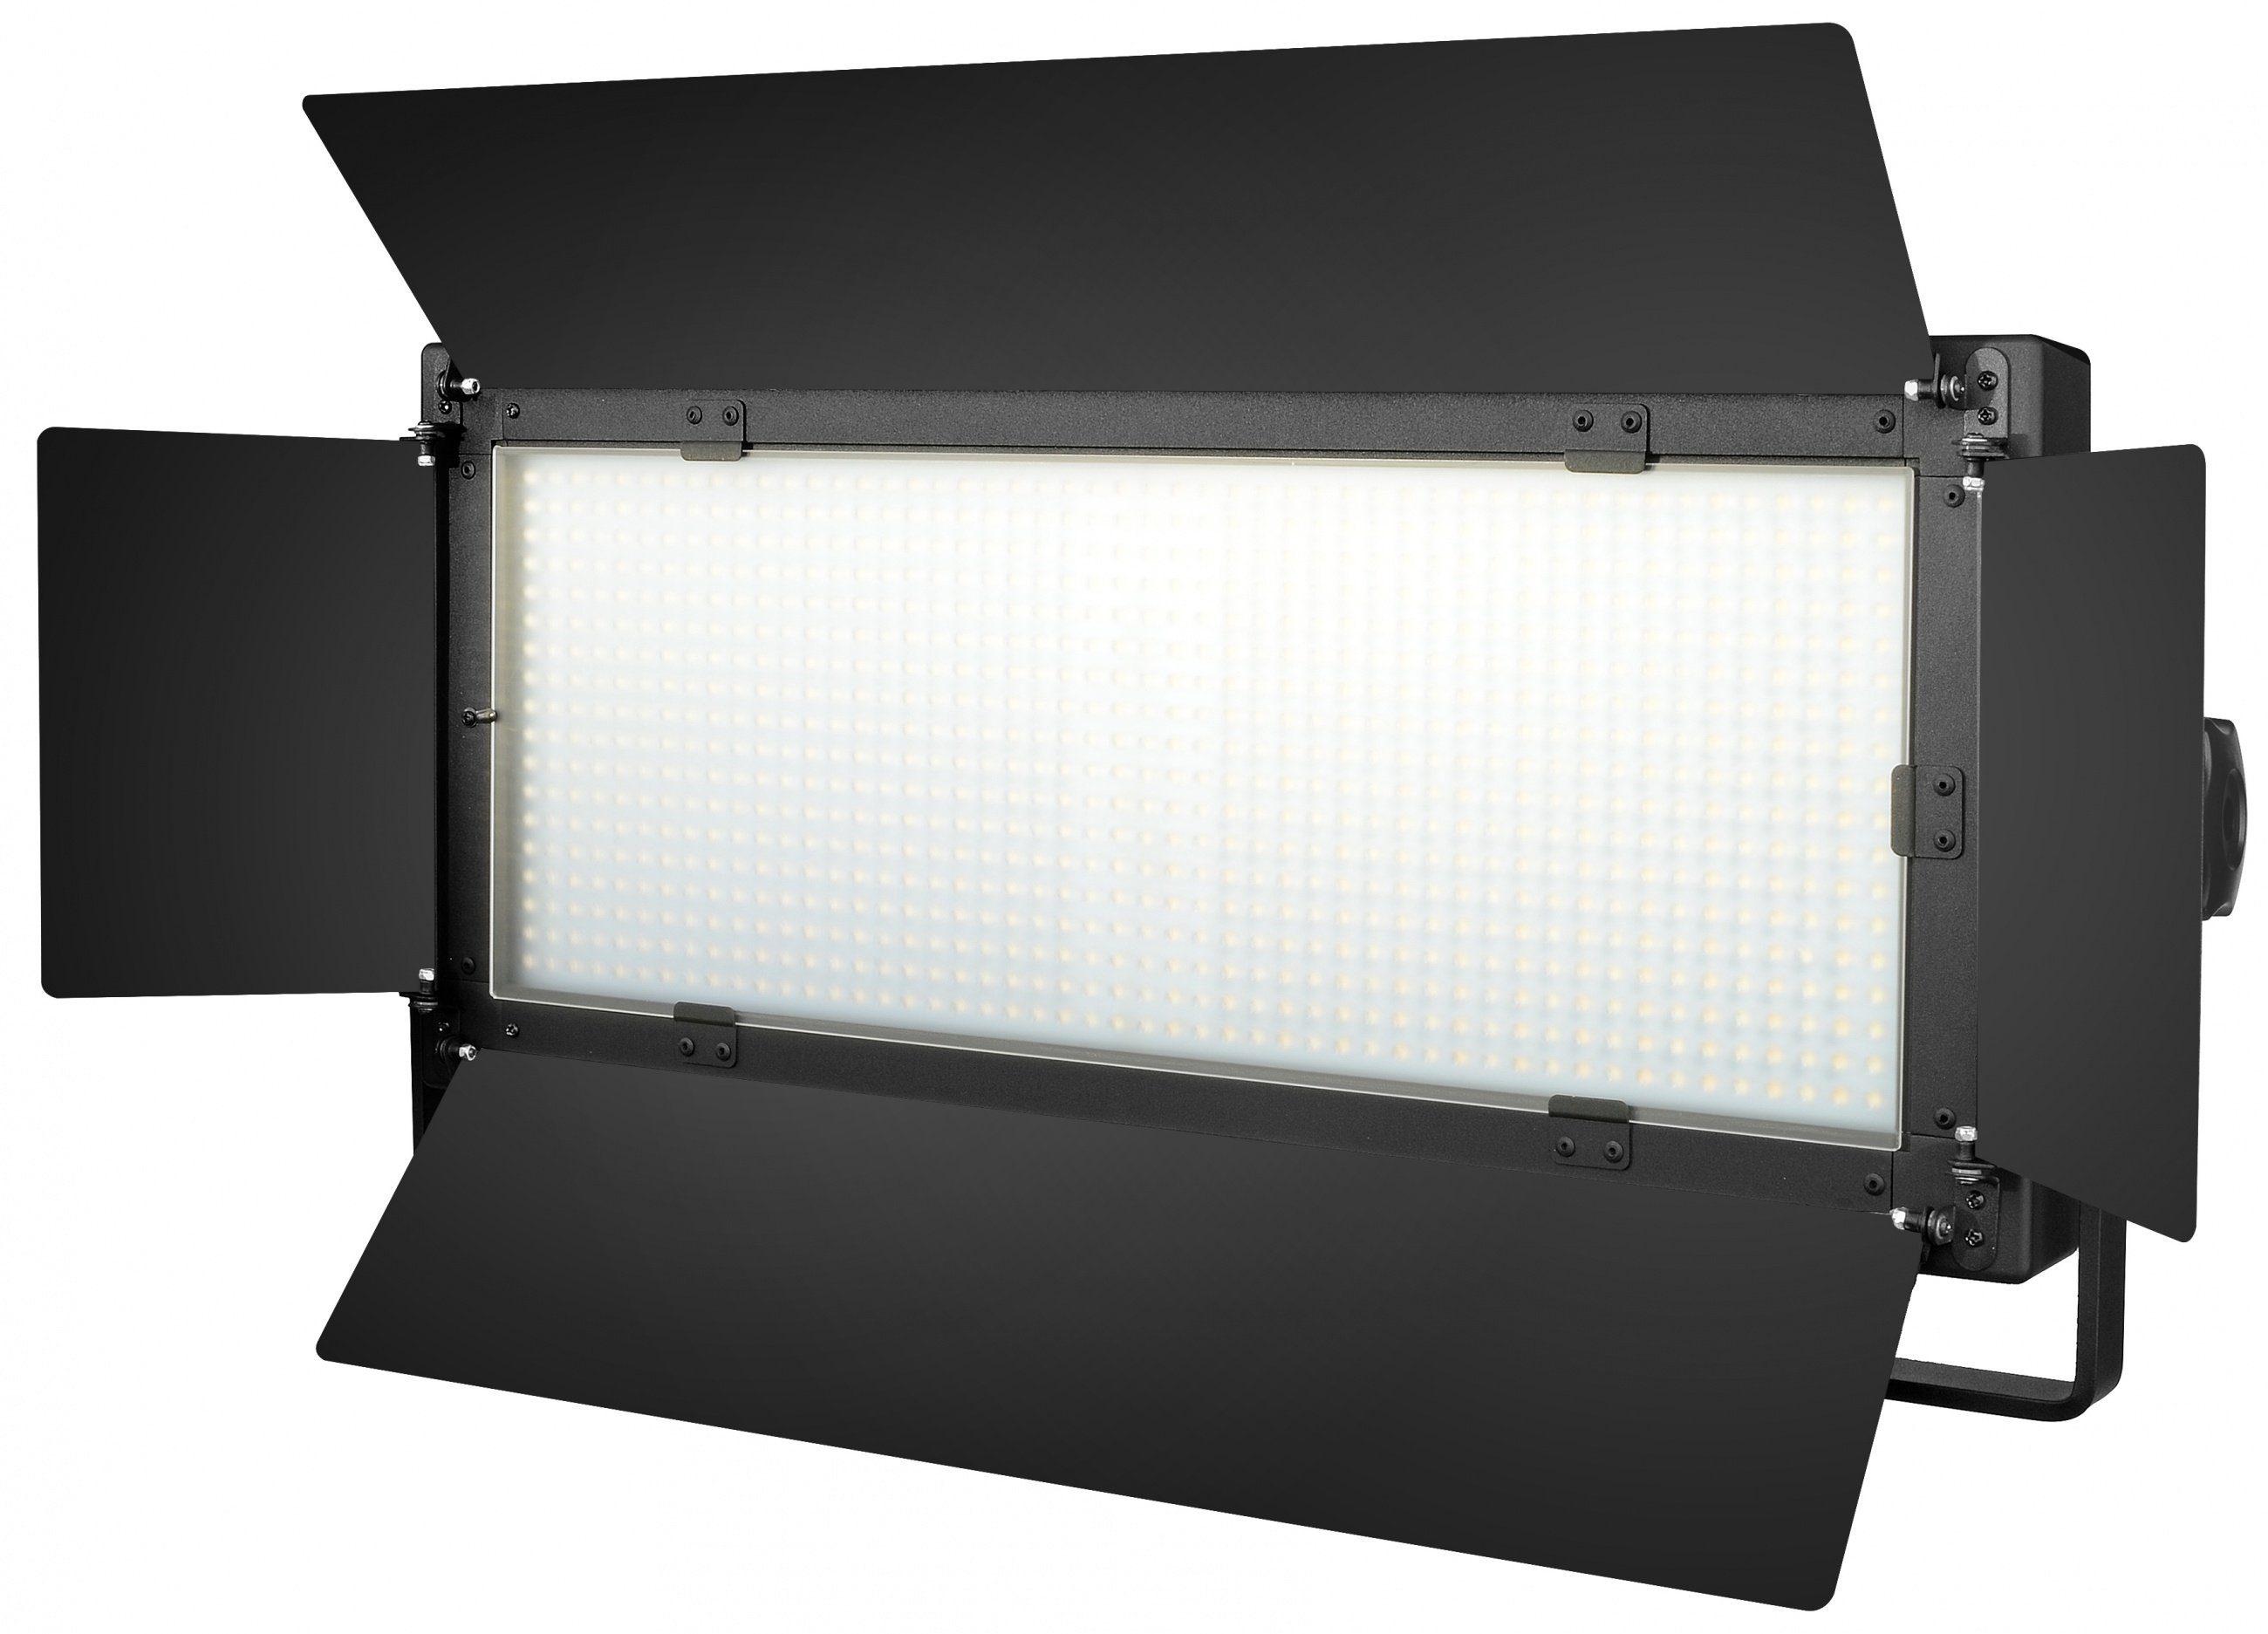 Bresser Fotostudio »LG-900 LED Flächenleuchte 54W/8.860LUX«